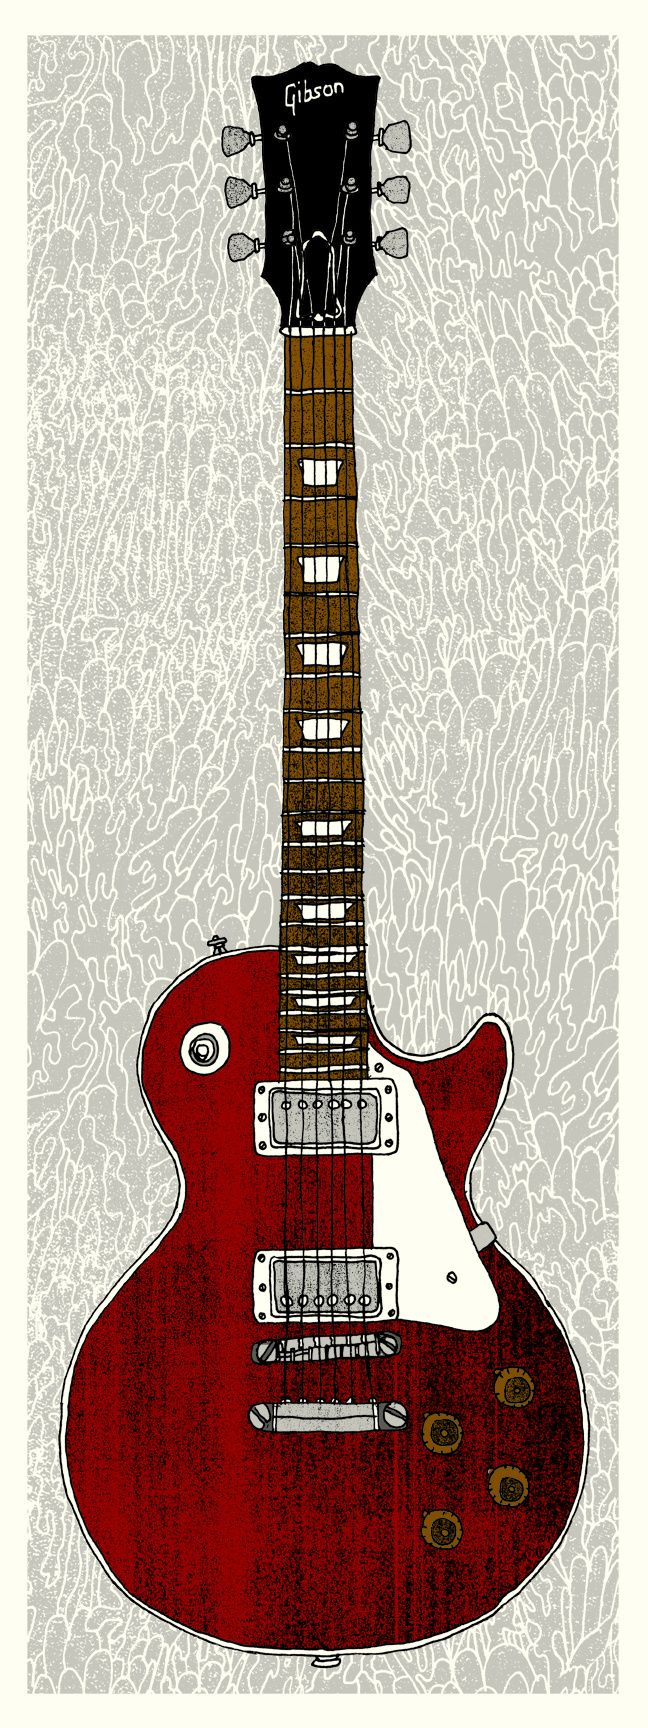 Gibson, guitar, electric guitar, Nate Duval